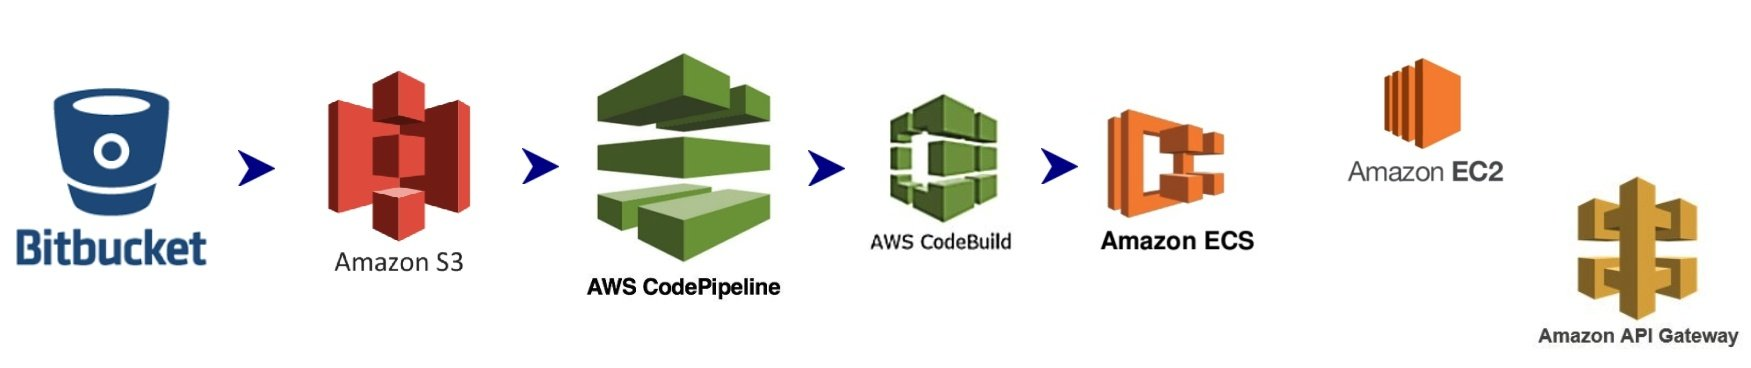 Bitbucket > Amazon: S3 > CodePipeline > CodeBuild > ECS / EC2 / API Gateway